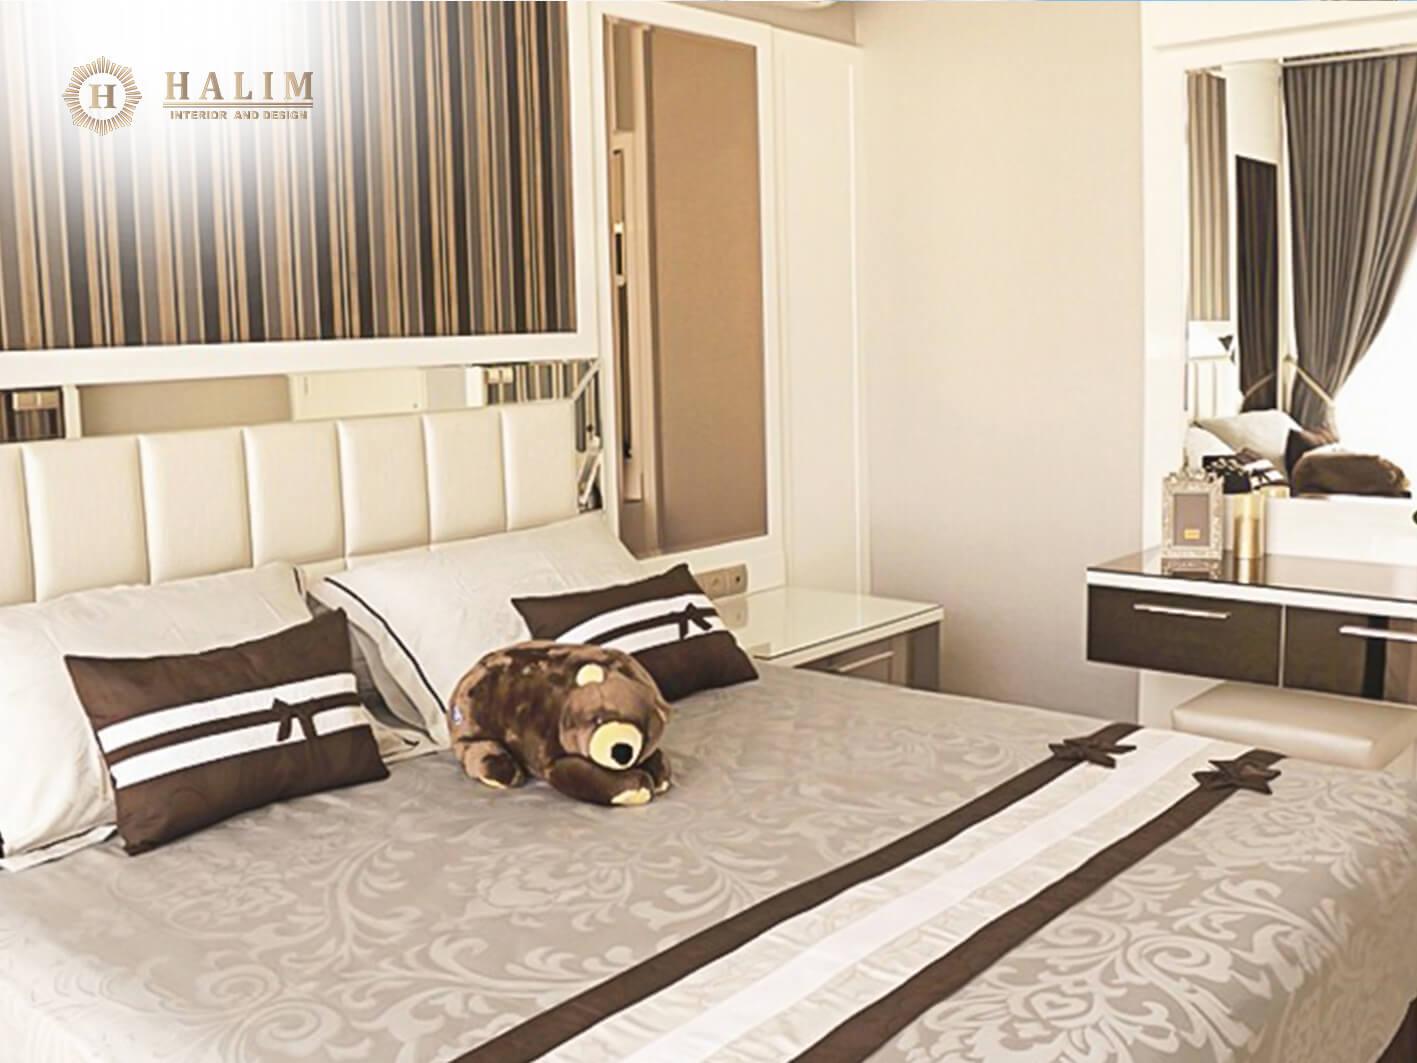 Halim, Interior, modern, furniture, contemporer american style, minimalist, european, classic, surabaya, Lenmarc Adhiwangsa, 6a1a